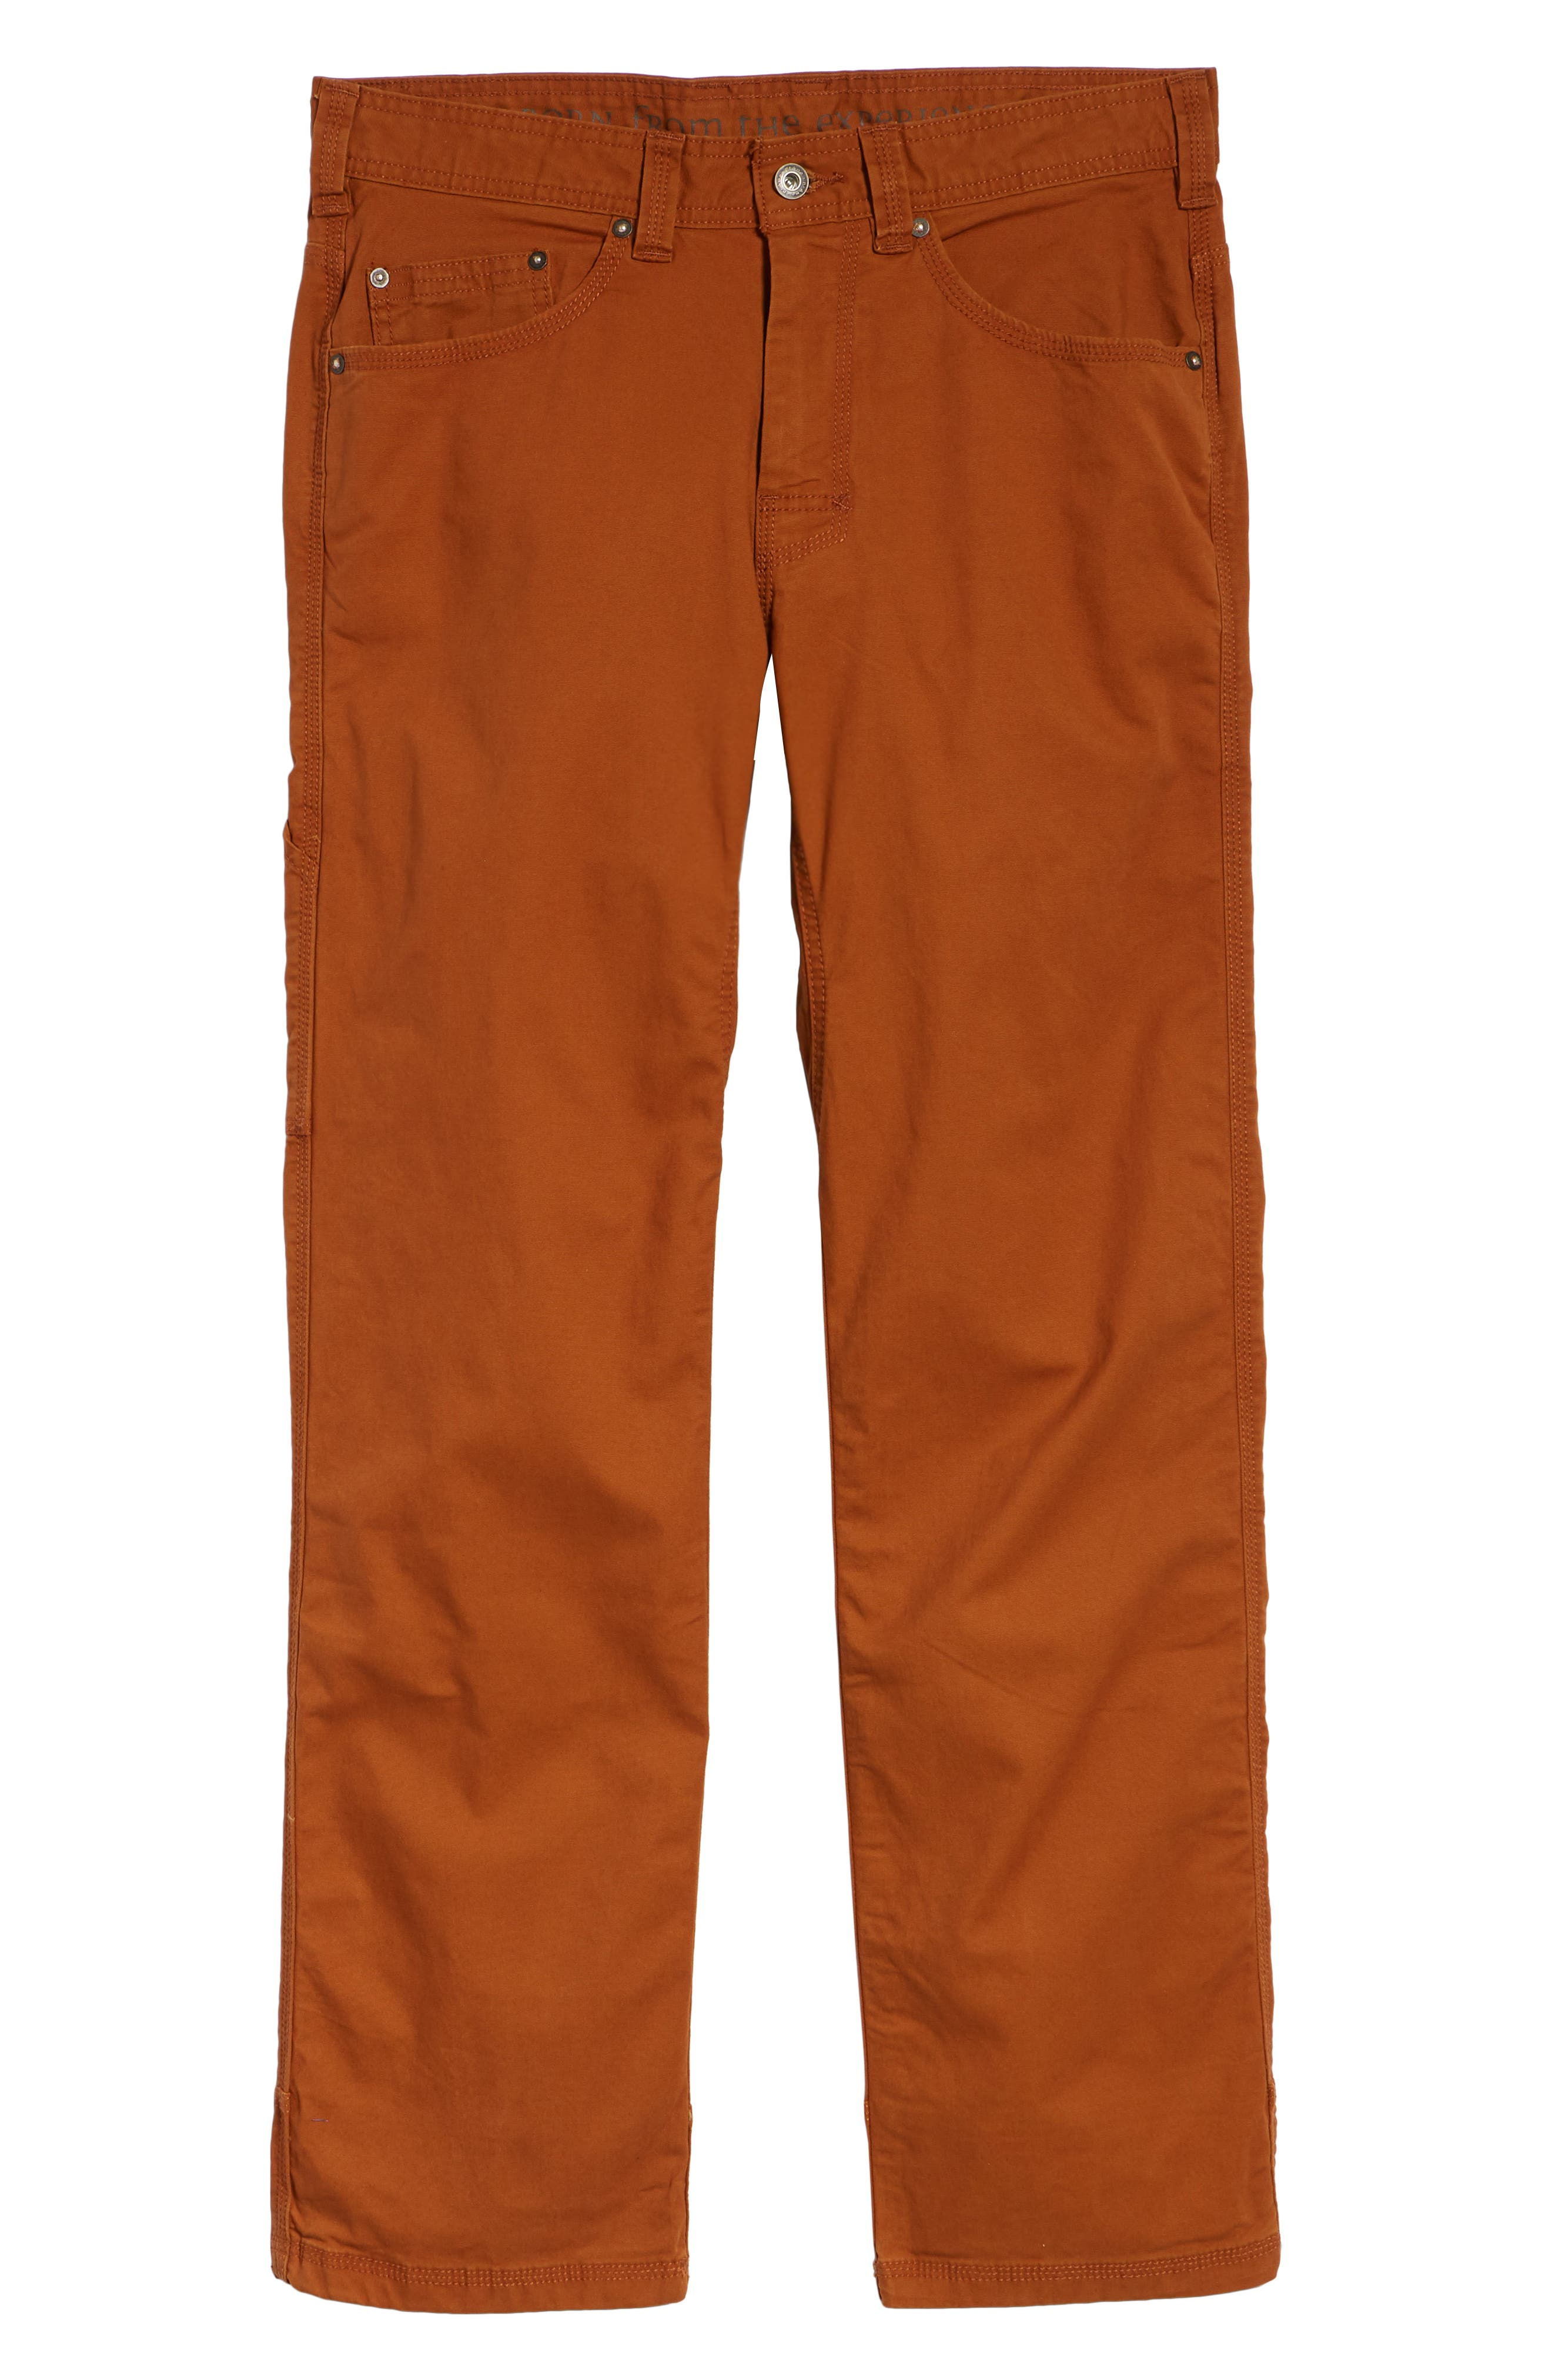 Bronson Pants,                             Alternate thumbnail 6, color,                             BURNT CARAMEL